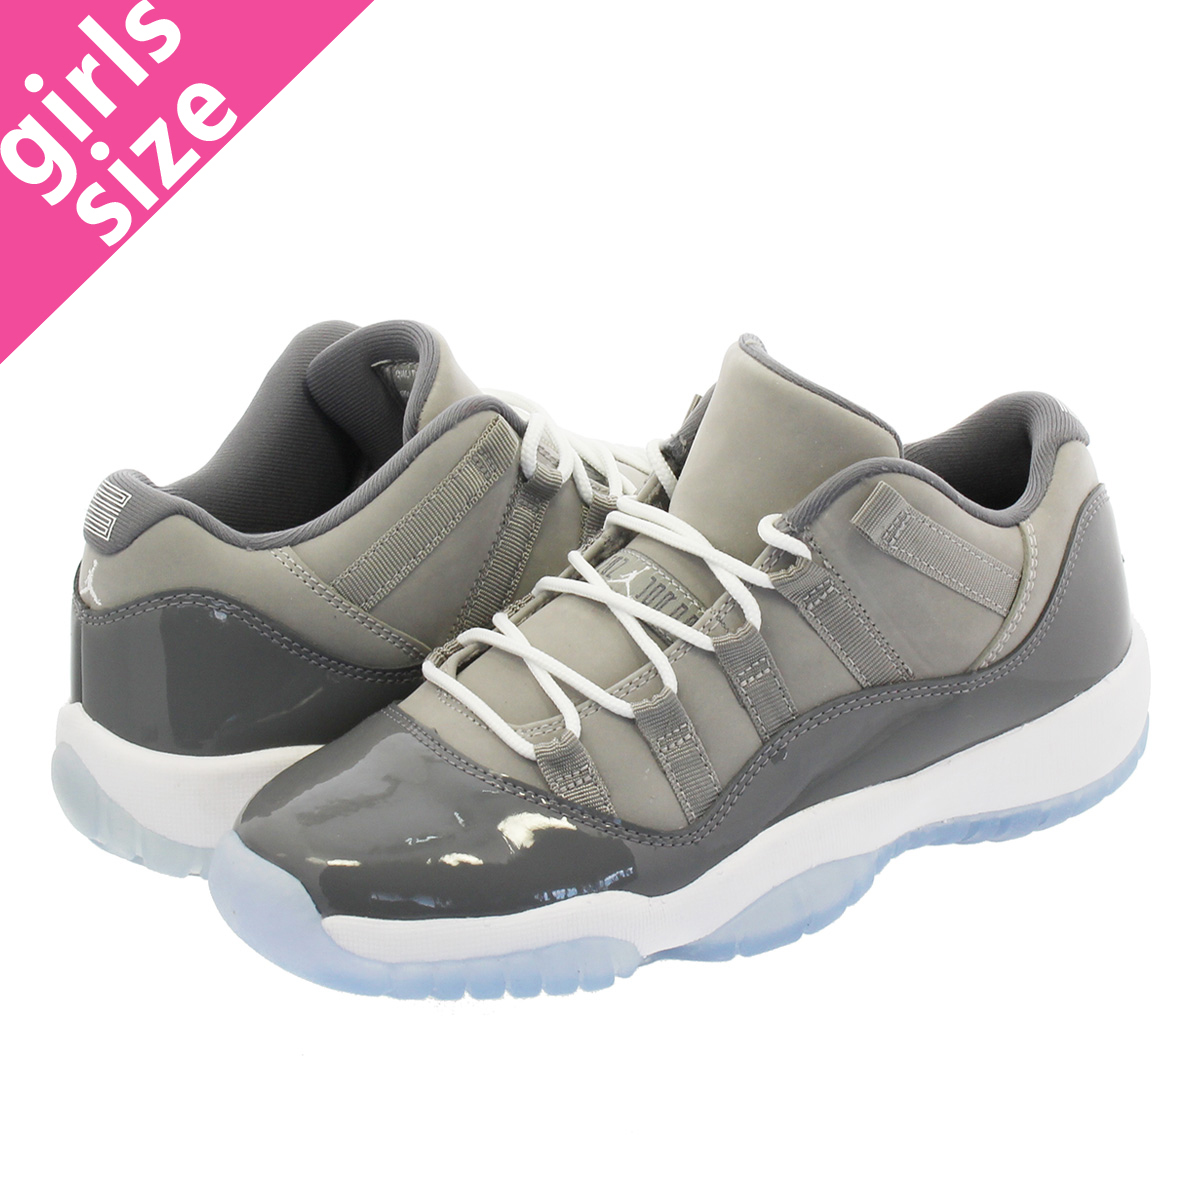 f08c02980e4f NIKE AIR JORDAN 11 RETRO LOW BG Nike Air Jordan 11 nostalgic low BG MEDIUM  GREY GUMSMOKE WHITE 528